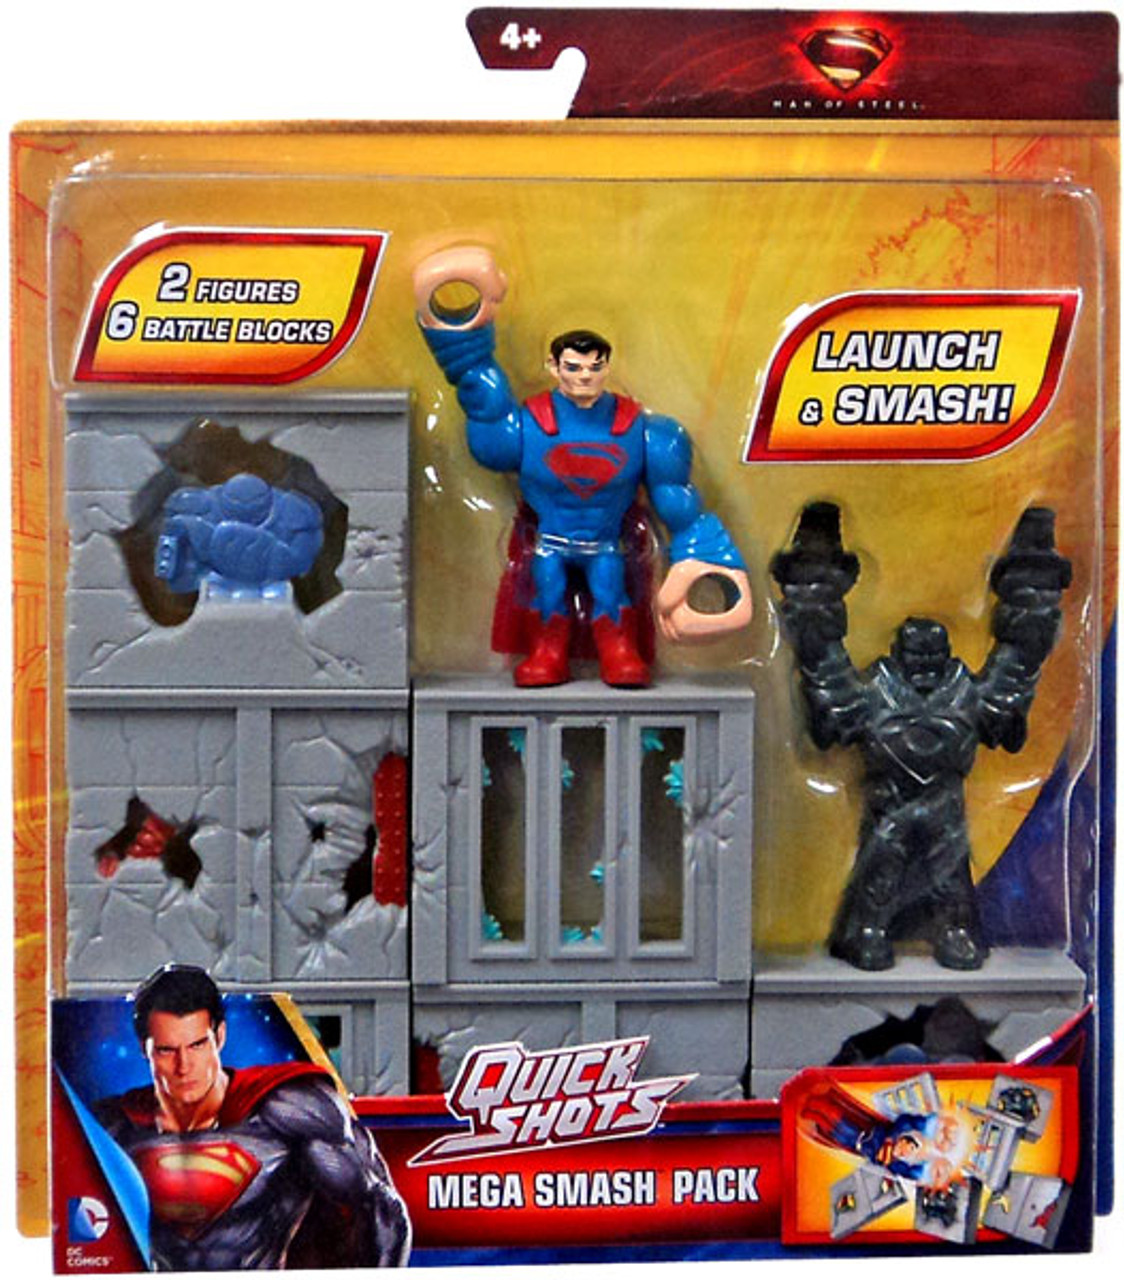 Superman Man of Steel Quick Shots Mega Smash Pack Playset